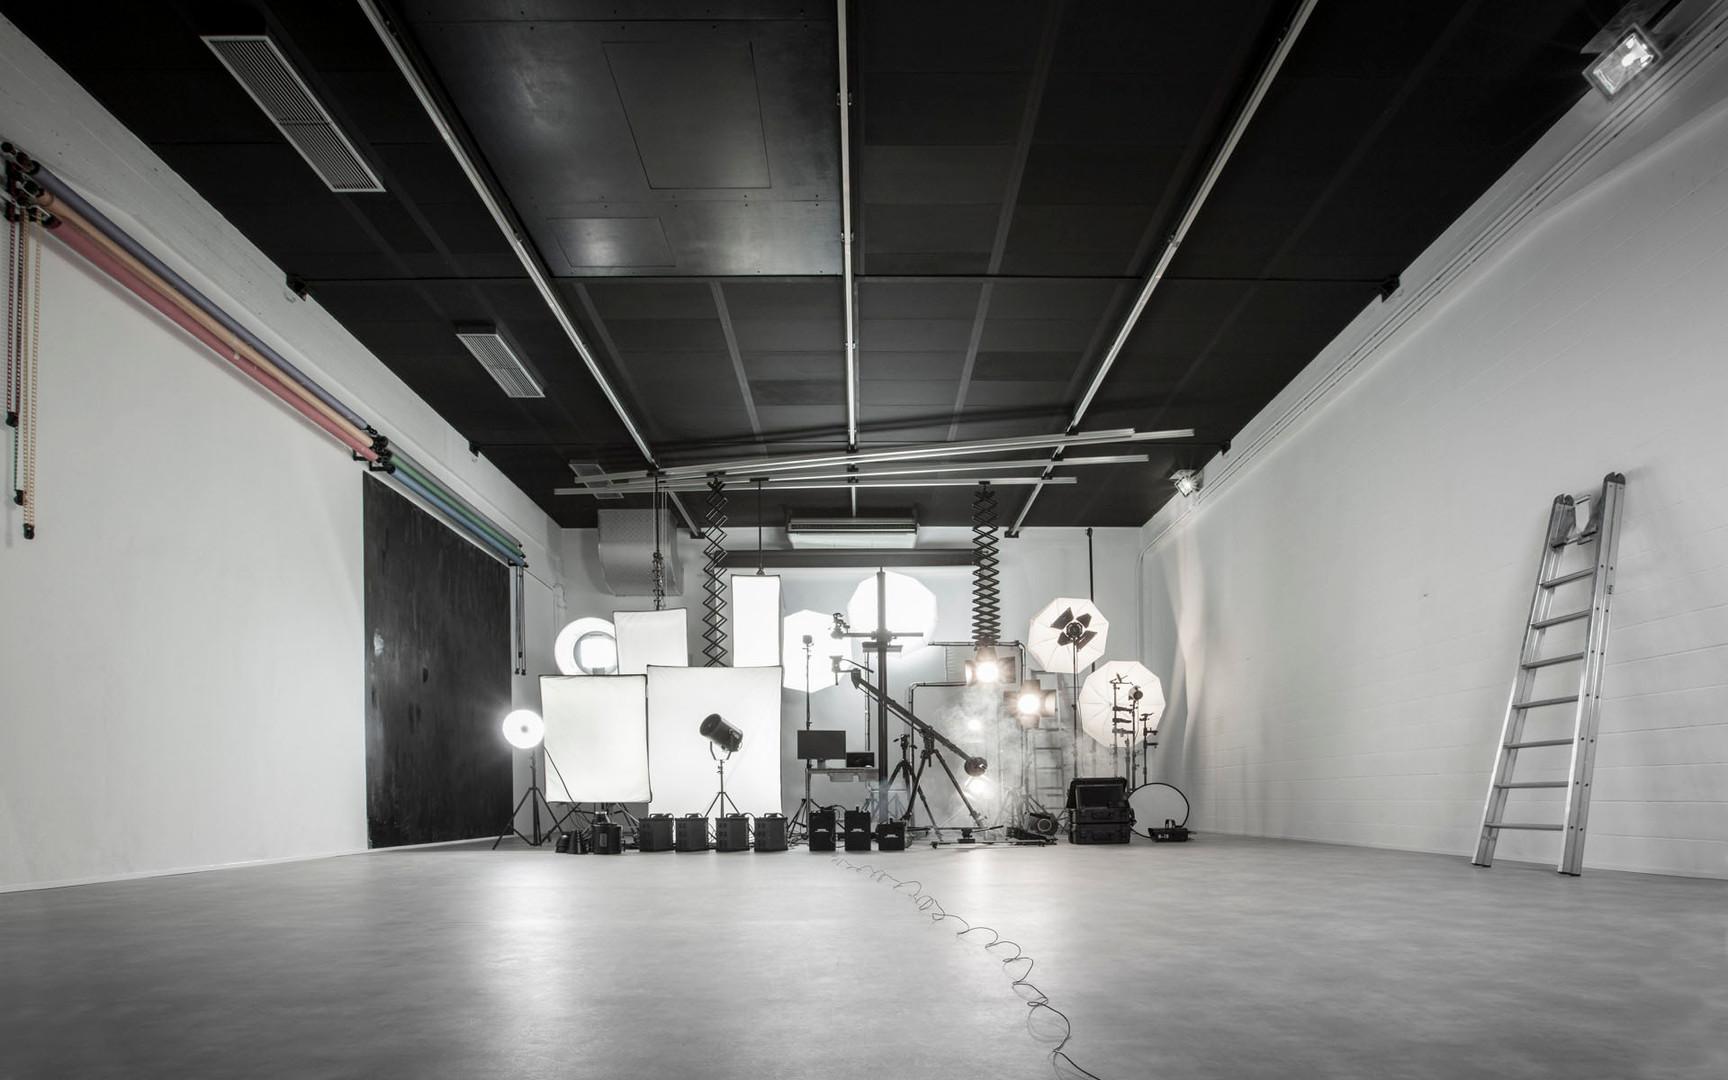 3 studio baraldi-2806.jpg